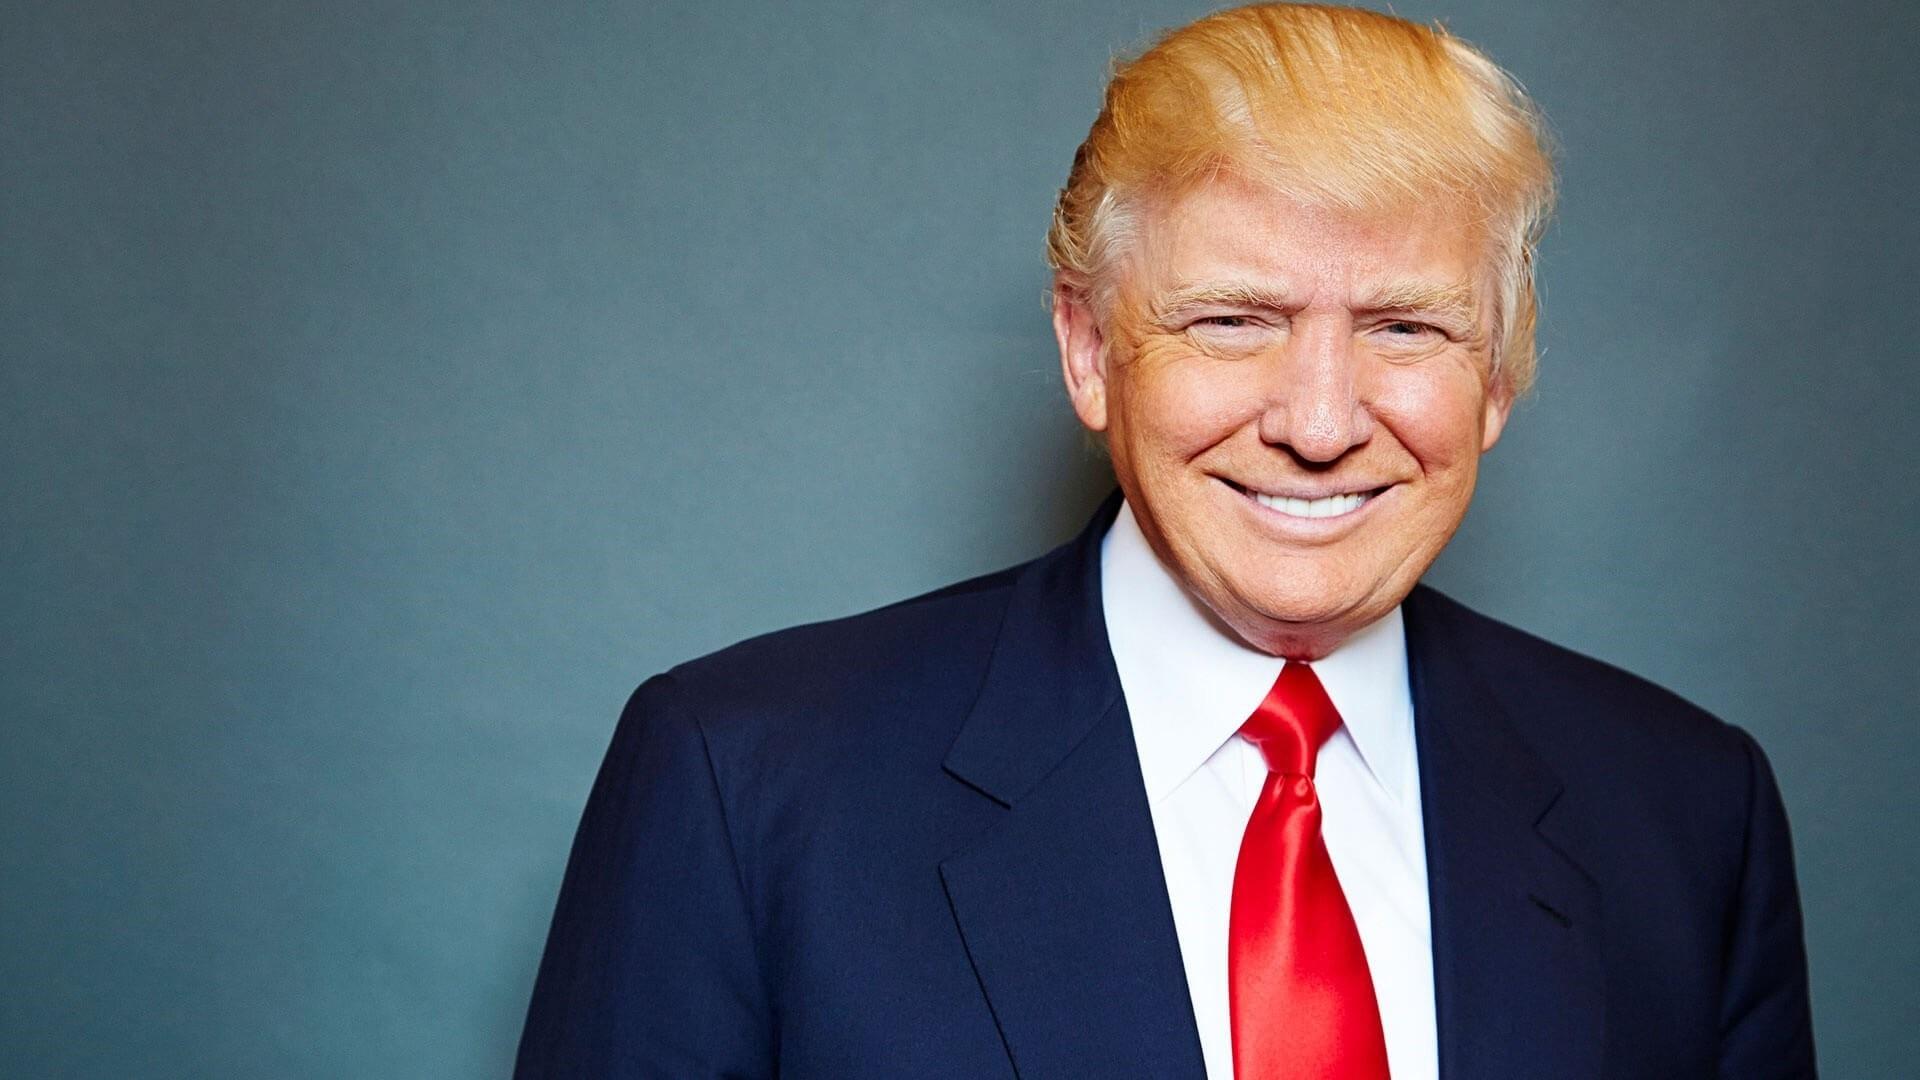 Donald Trump Wallpaper Picture hd